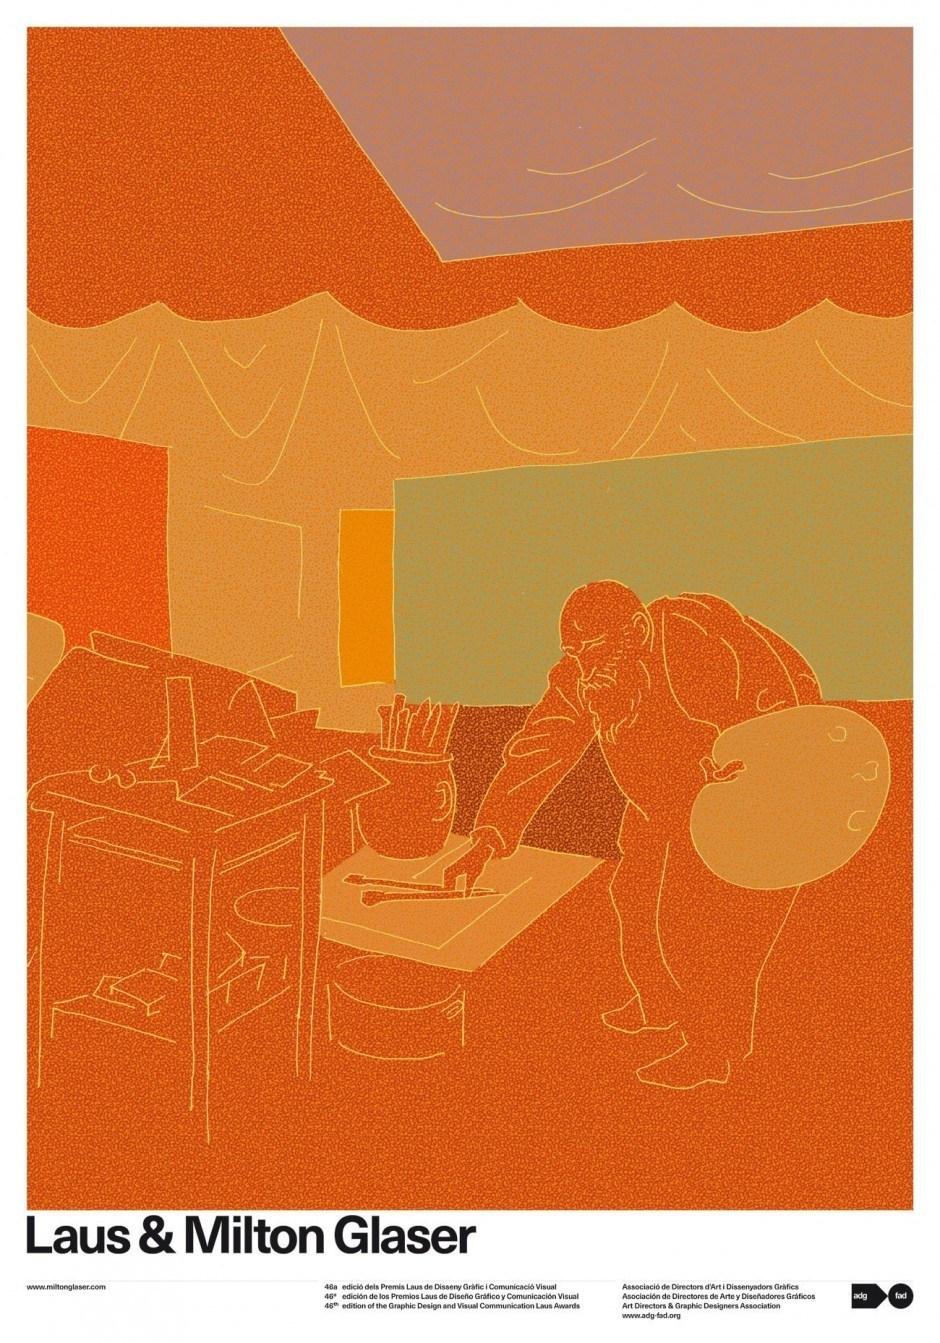 Laus & Milton Glaser